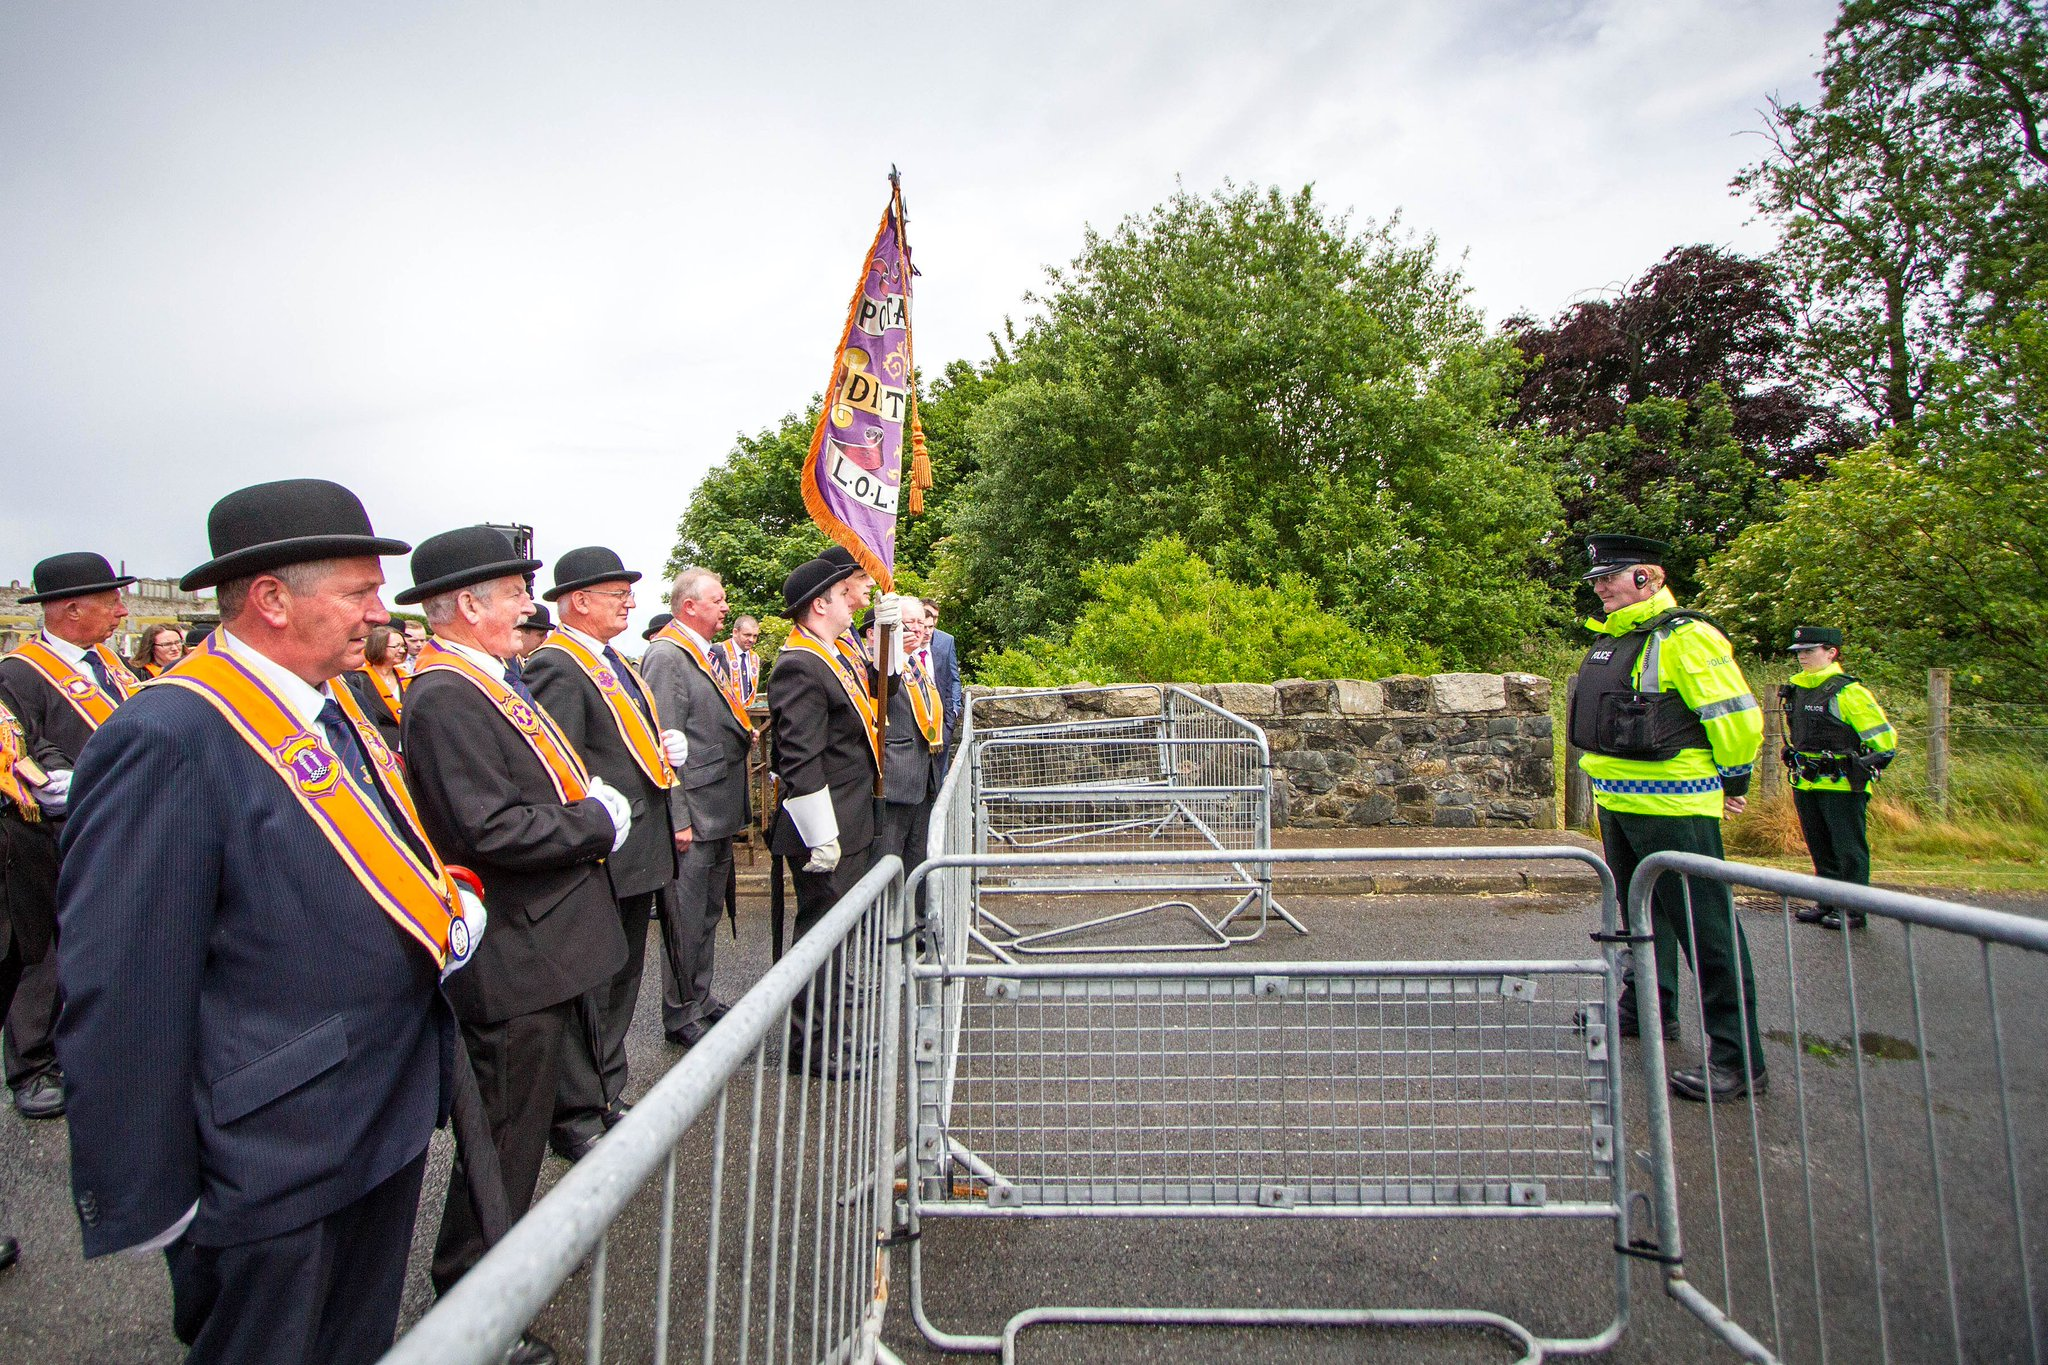 Grand Lodge calls for parading 'fresh start'